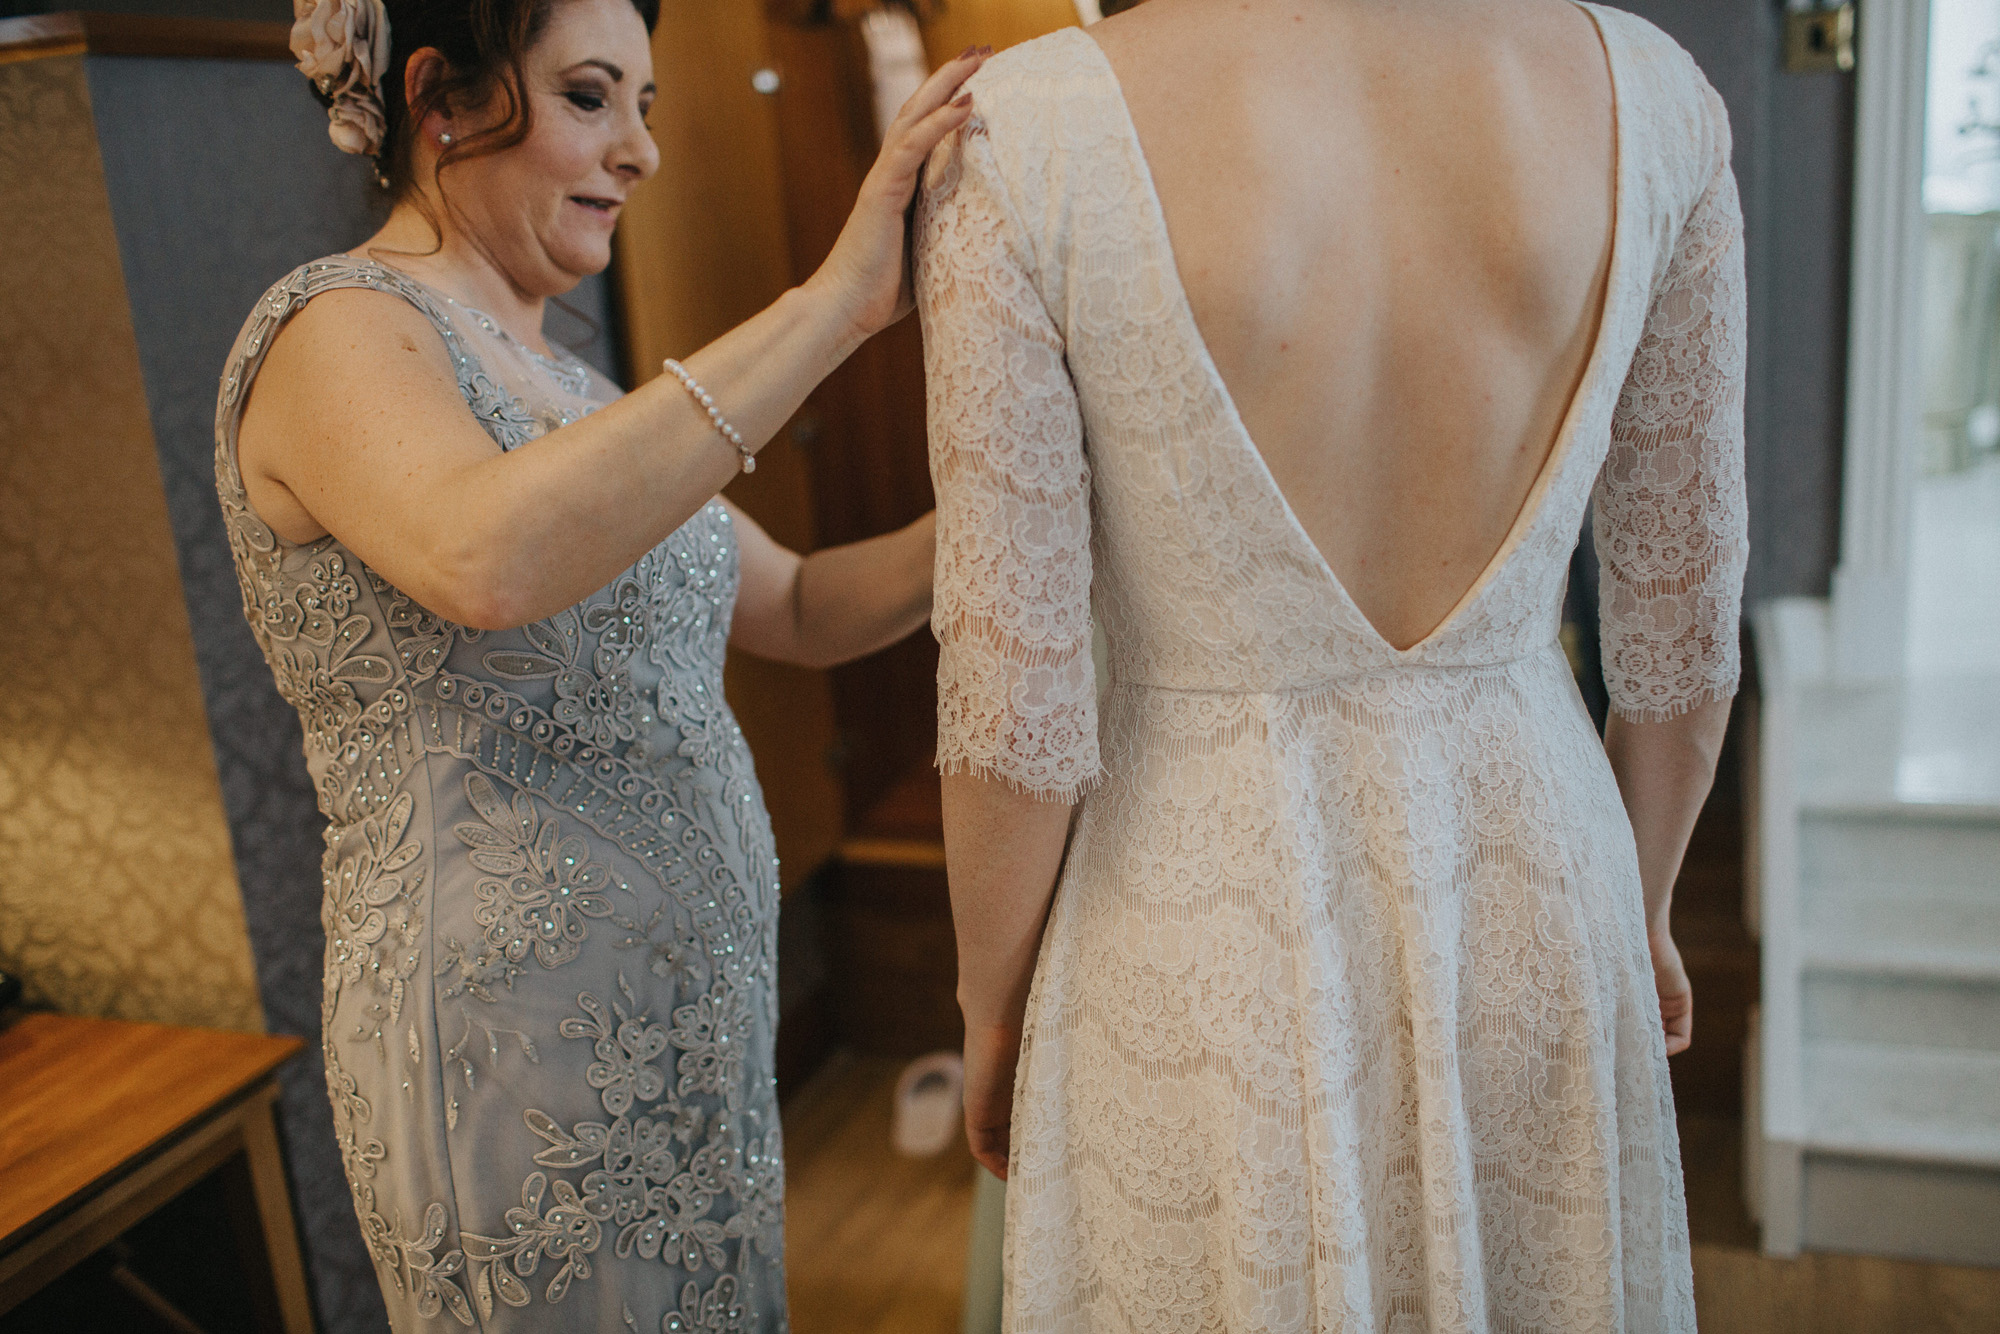 Kate-Beaumont-Lace-Flared-Dahlia-Gown-Leeds-Wedding-Bloom-Weddings-1.jpg